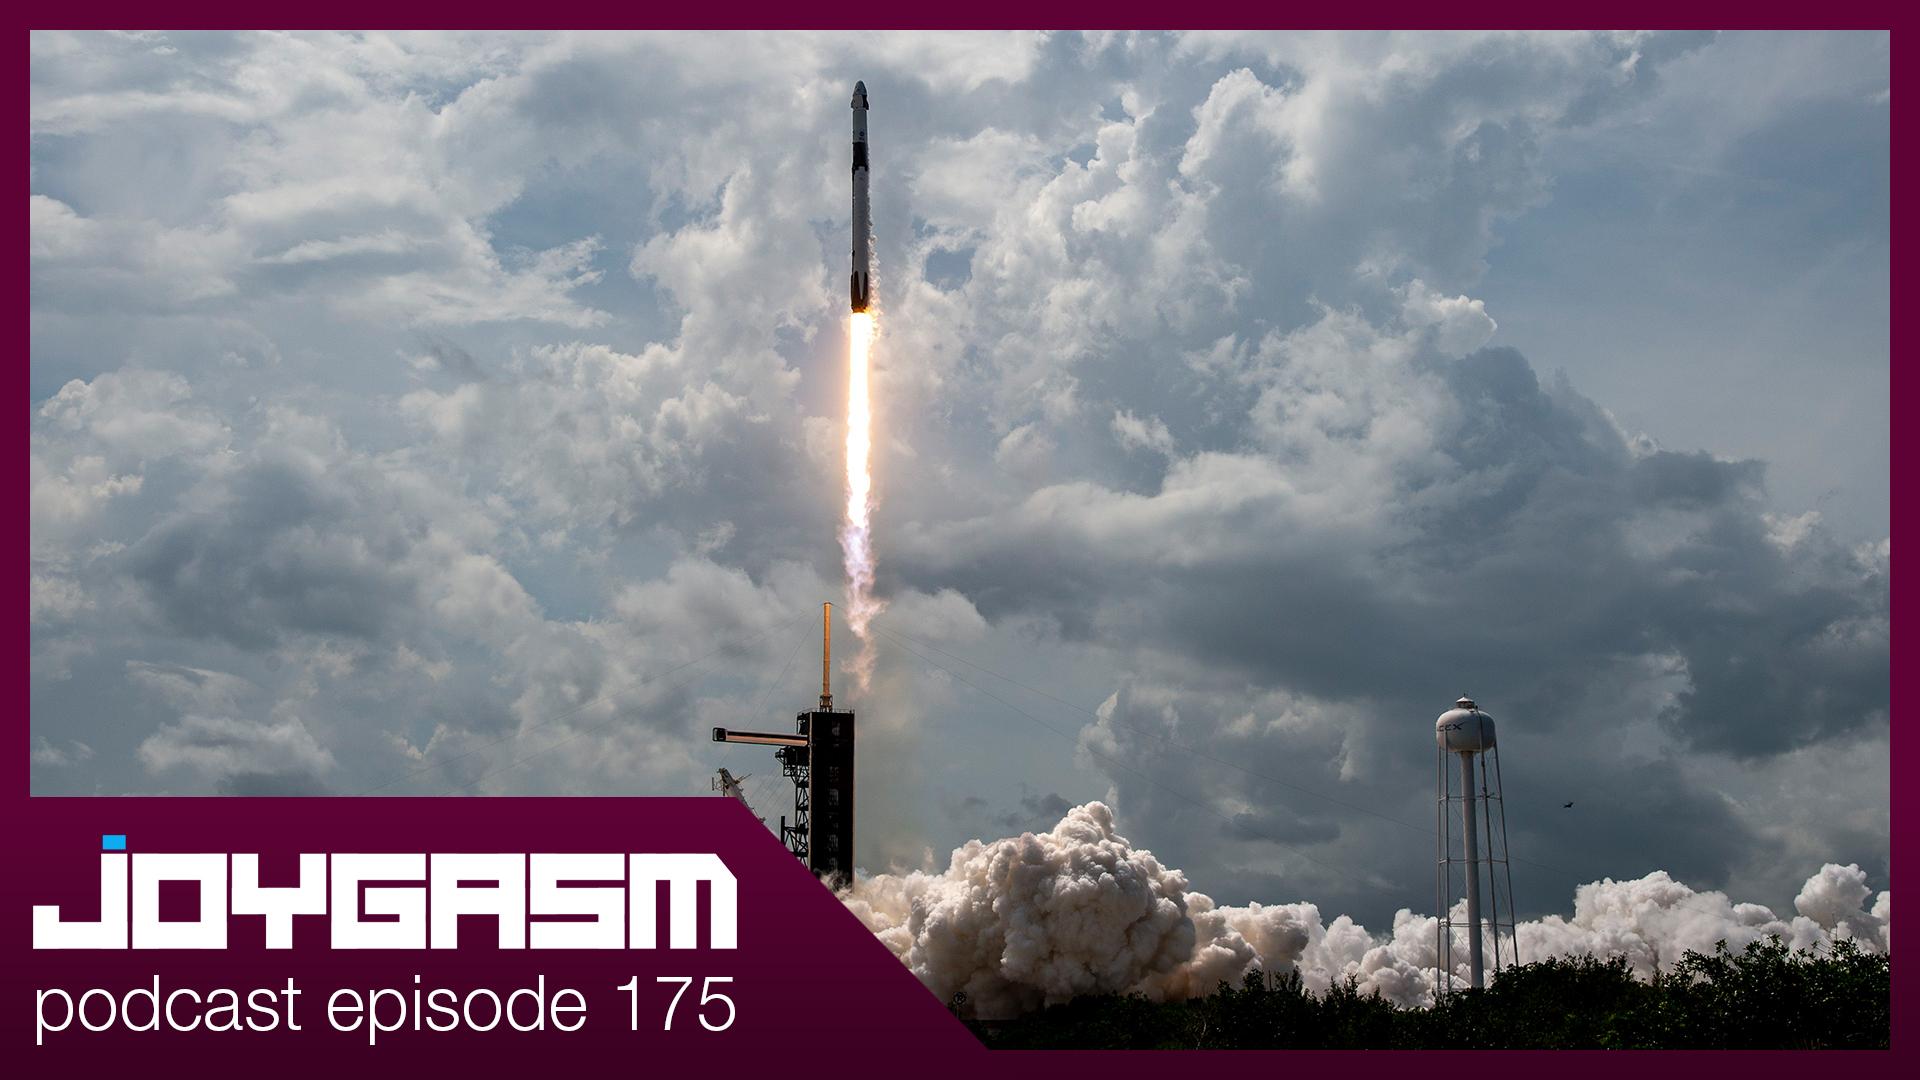 Ep. 175: Space X & NASA Make Historic Launch